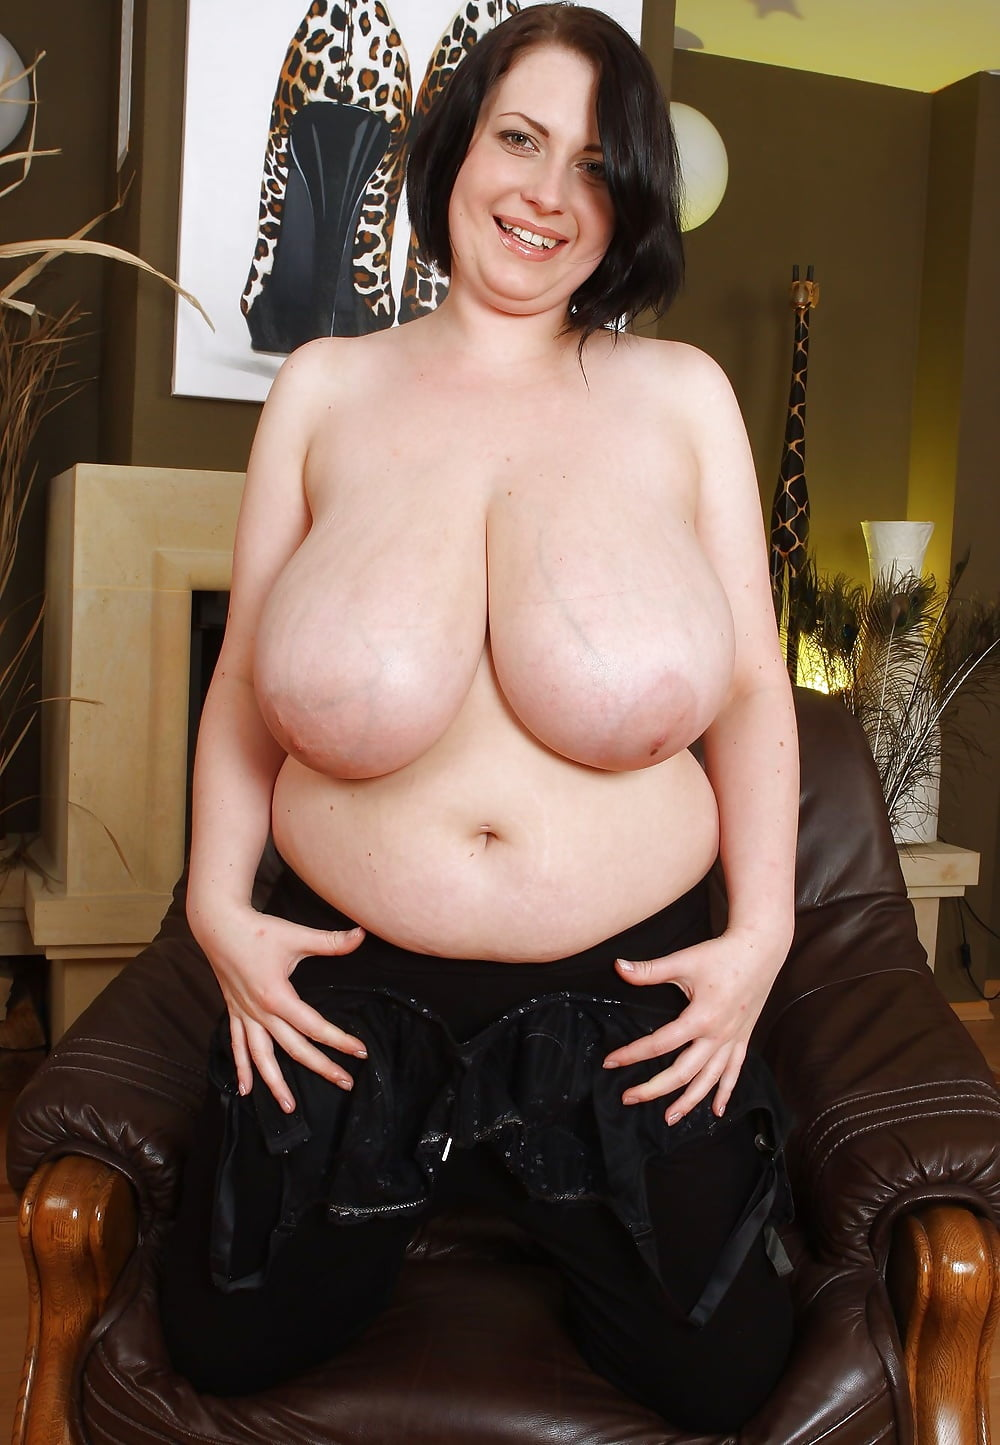 Stephanie mcmahon bikini desnudo